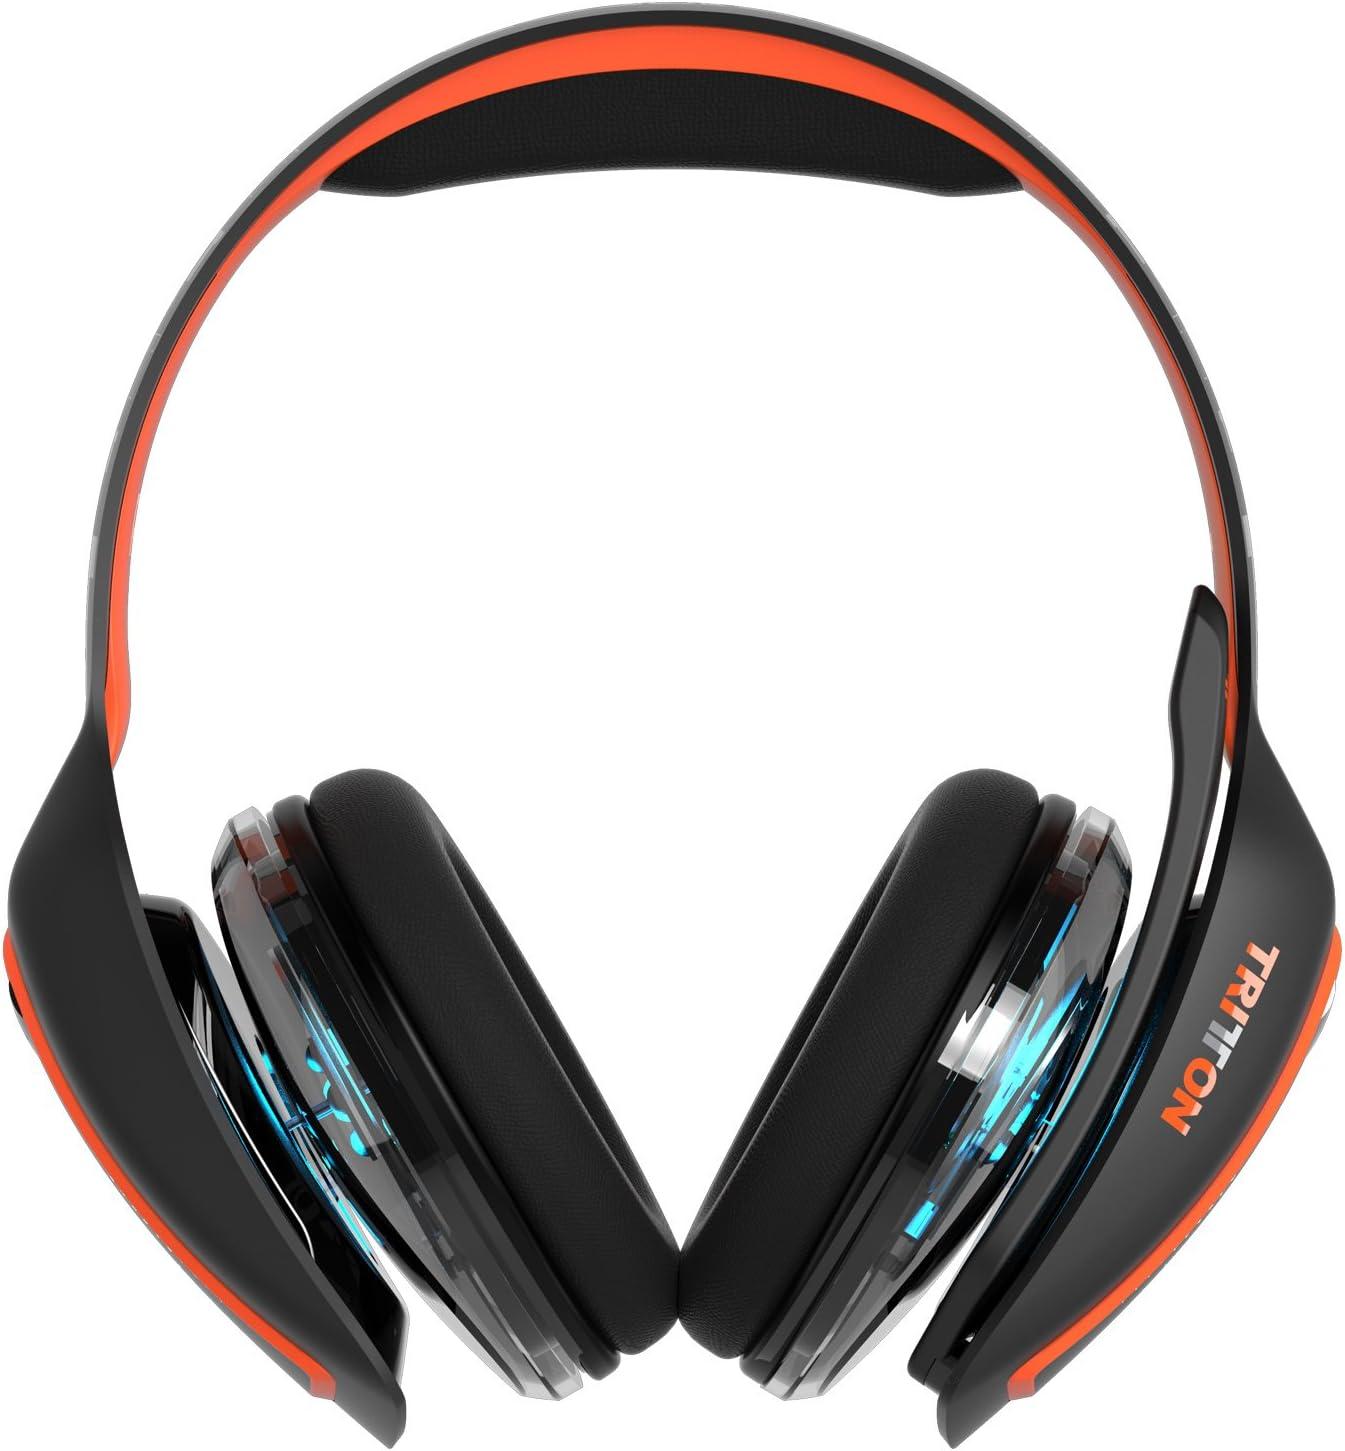 Amazon com: Mad Catz Tritton ARK 100 7 1 RGB Headset for PC